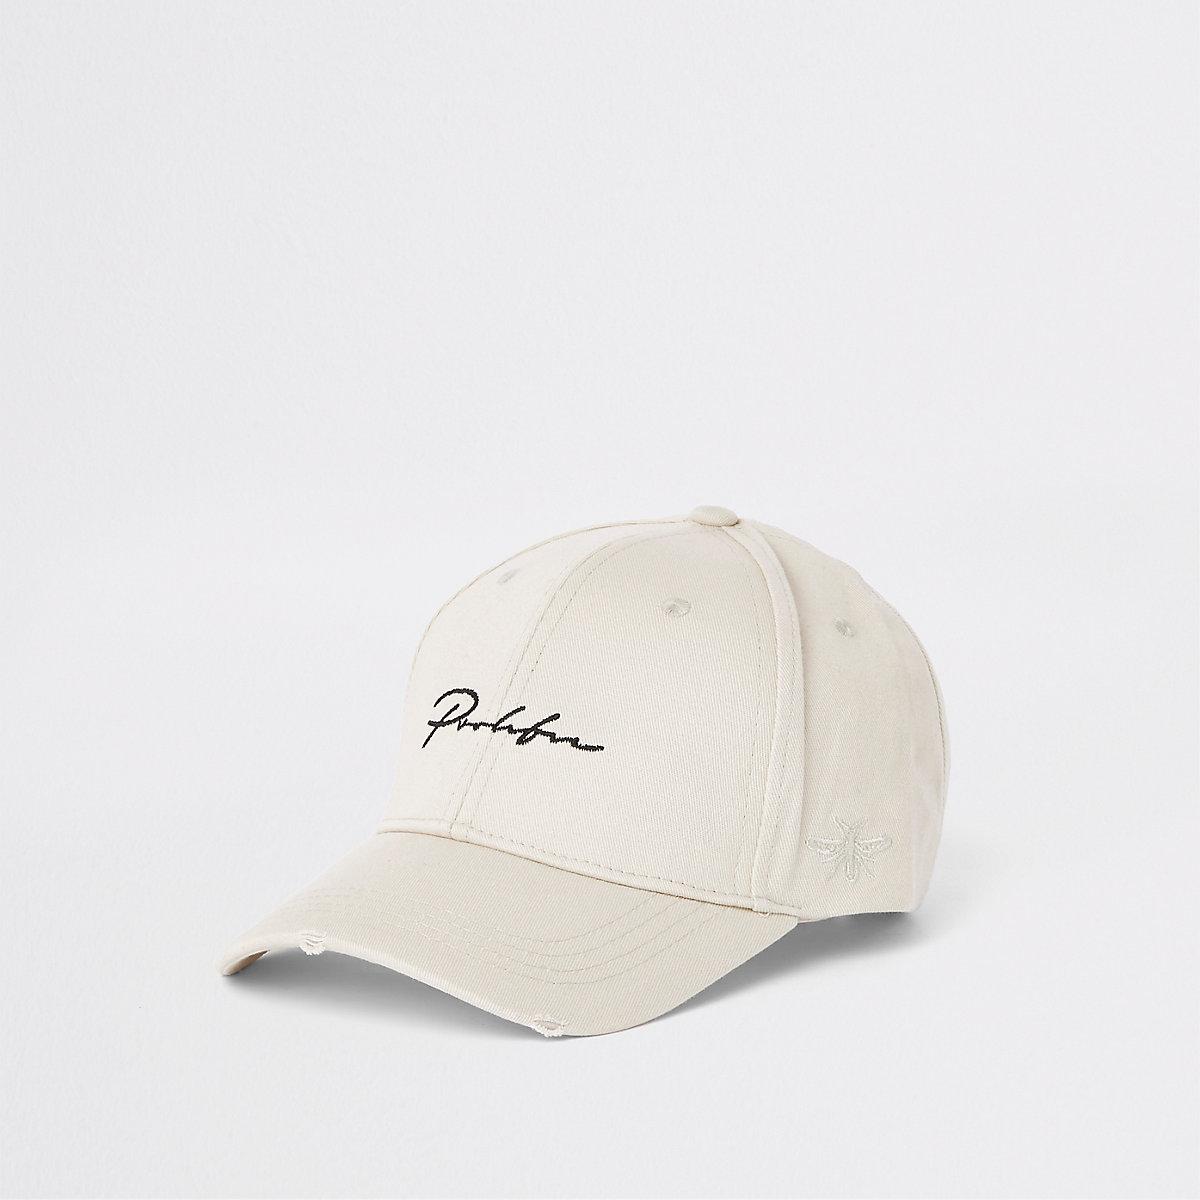 Ecru 'Prolific' wasp embroidery baseball cap